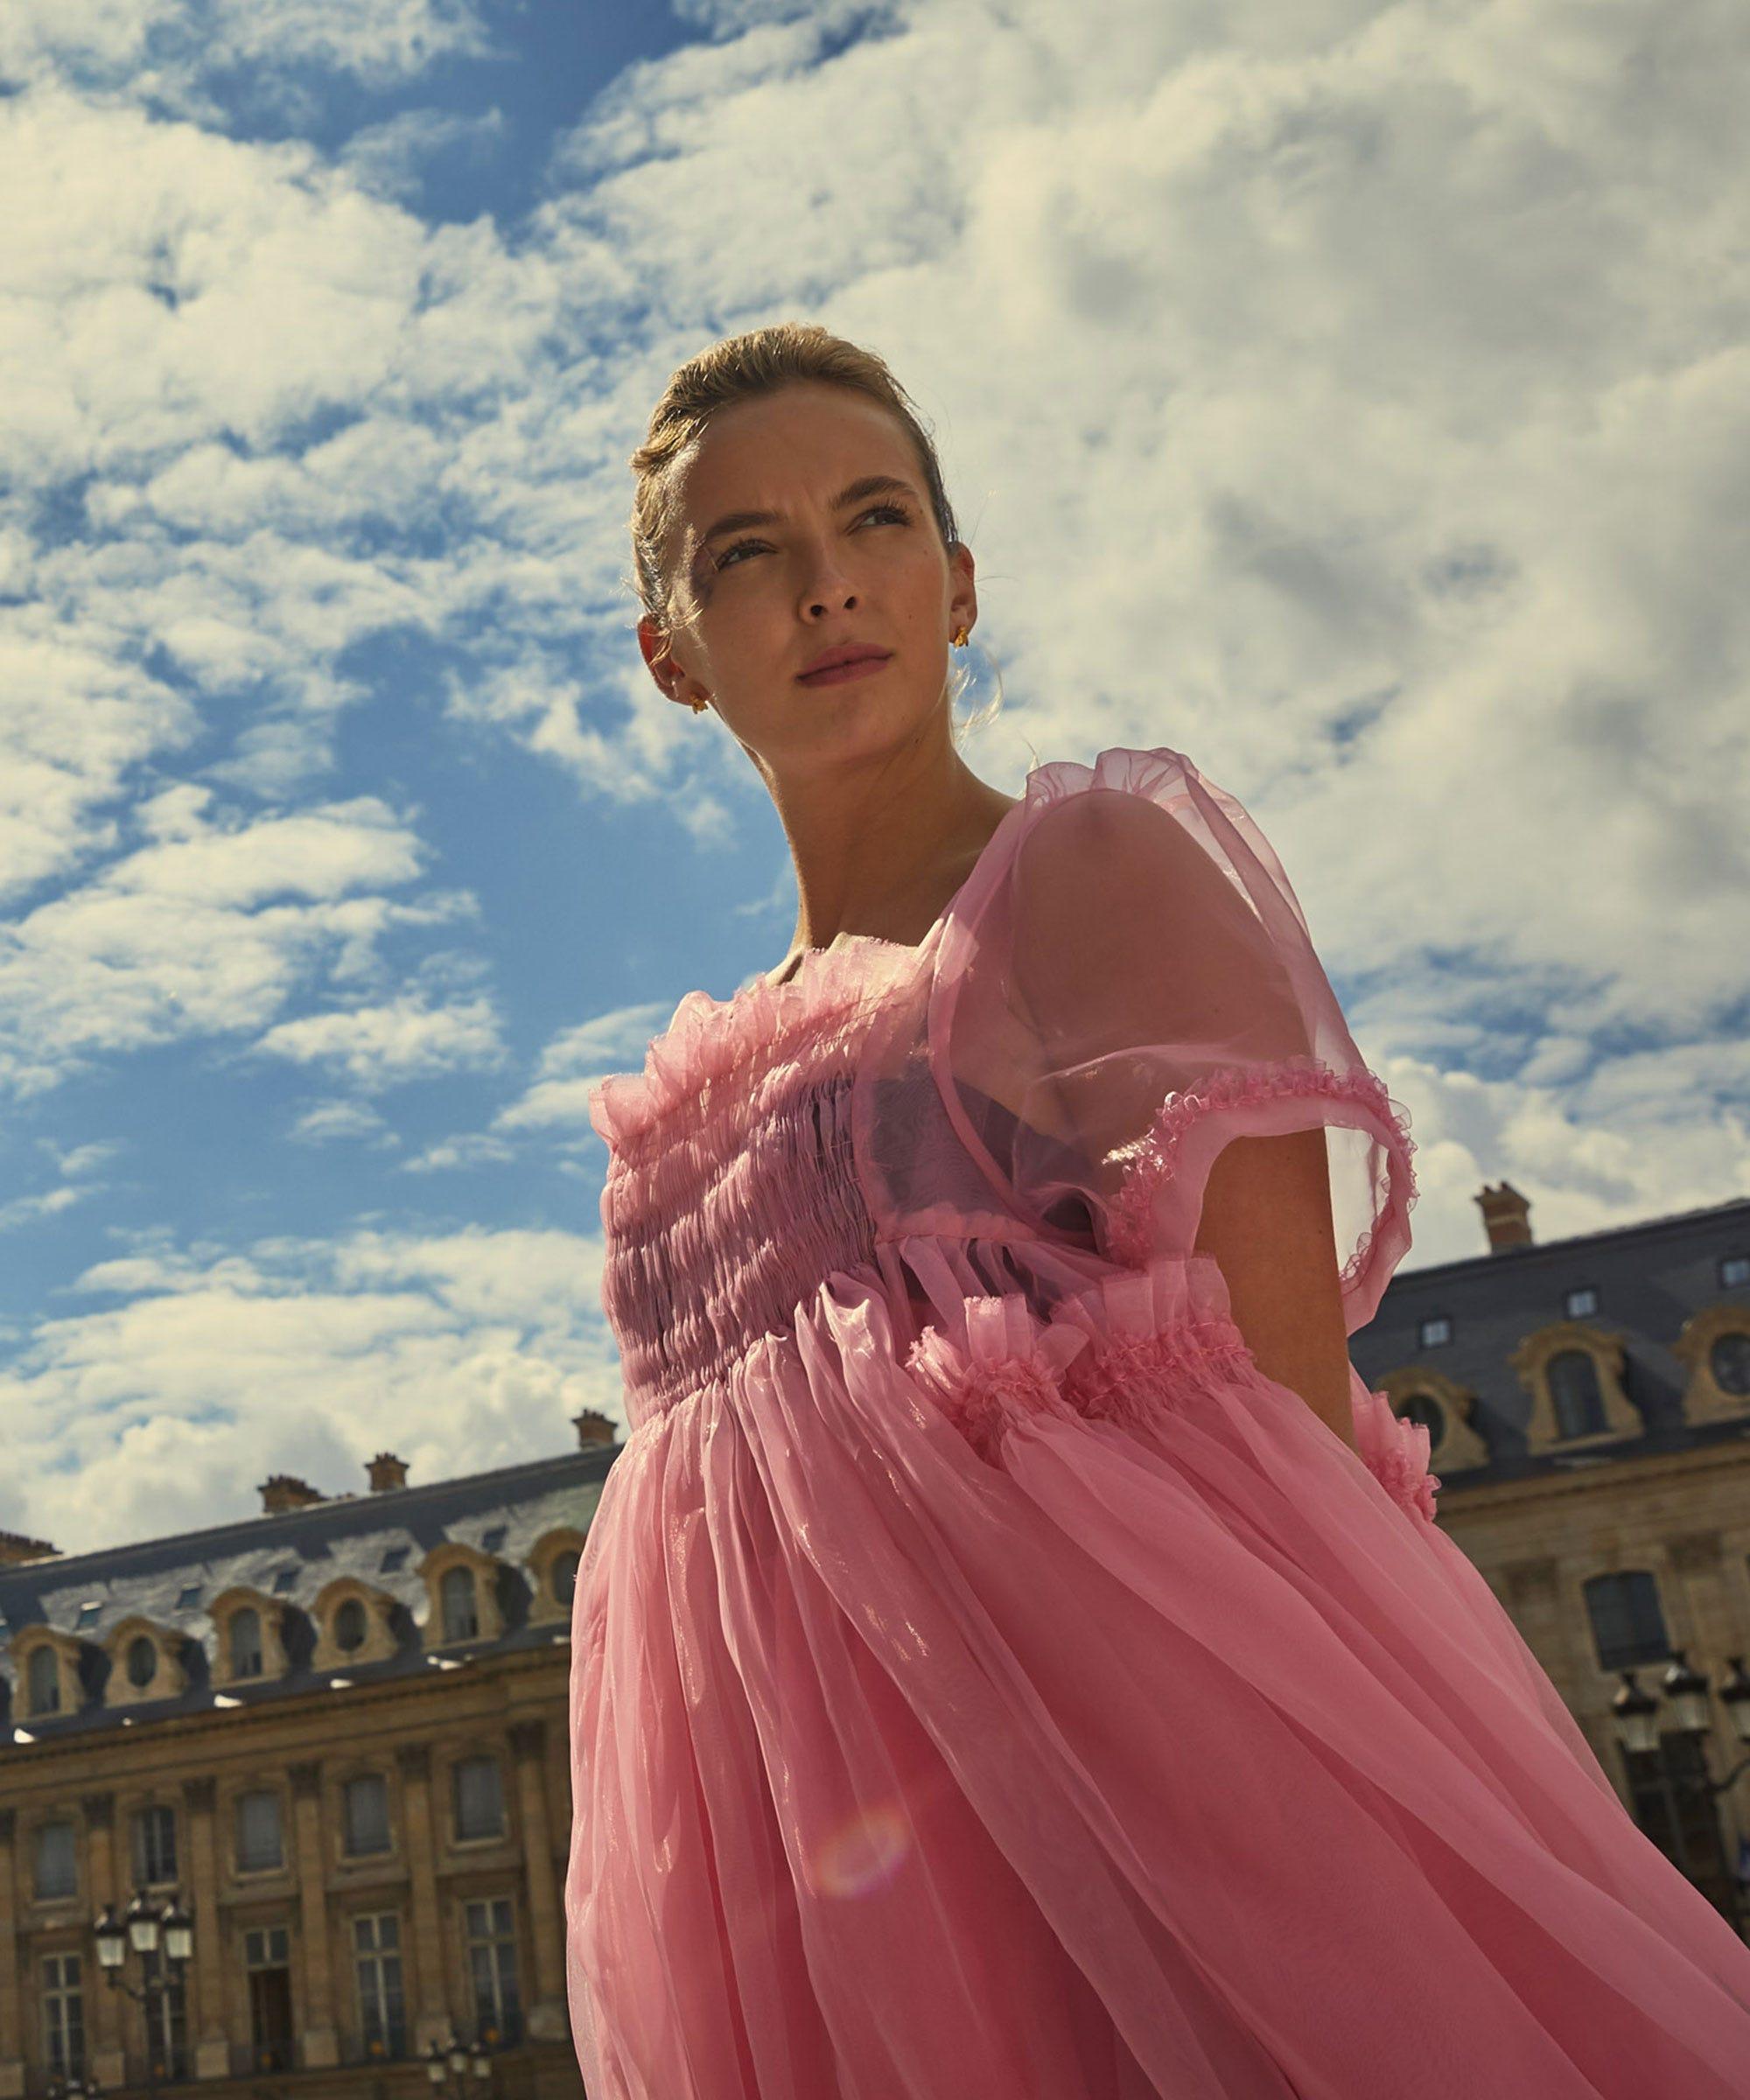 Villanelle's Parisian Apartment In Killing Eve Season 1 Is The Stuff Of Dreams